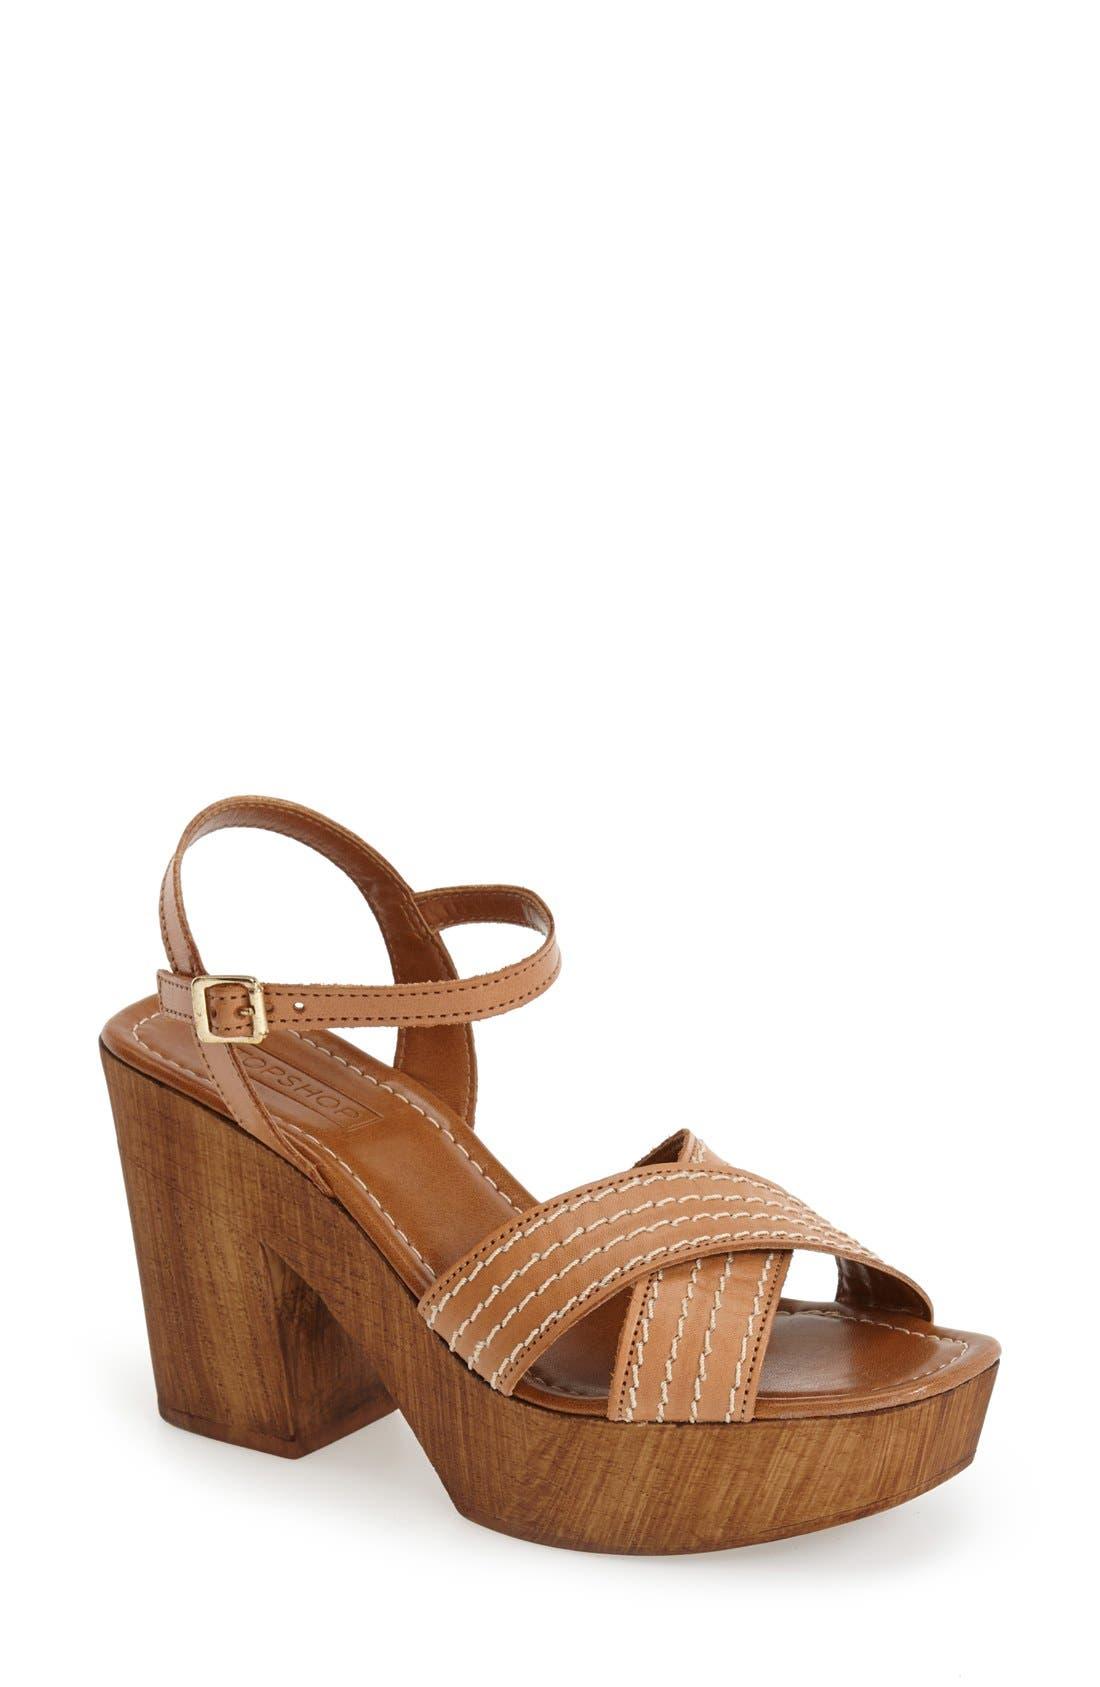 Alternate Image 1 Selected - Topshop 'Lauren' Clog Sandal (Women)